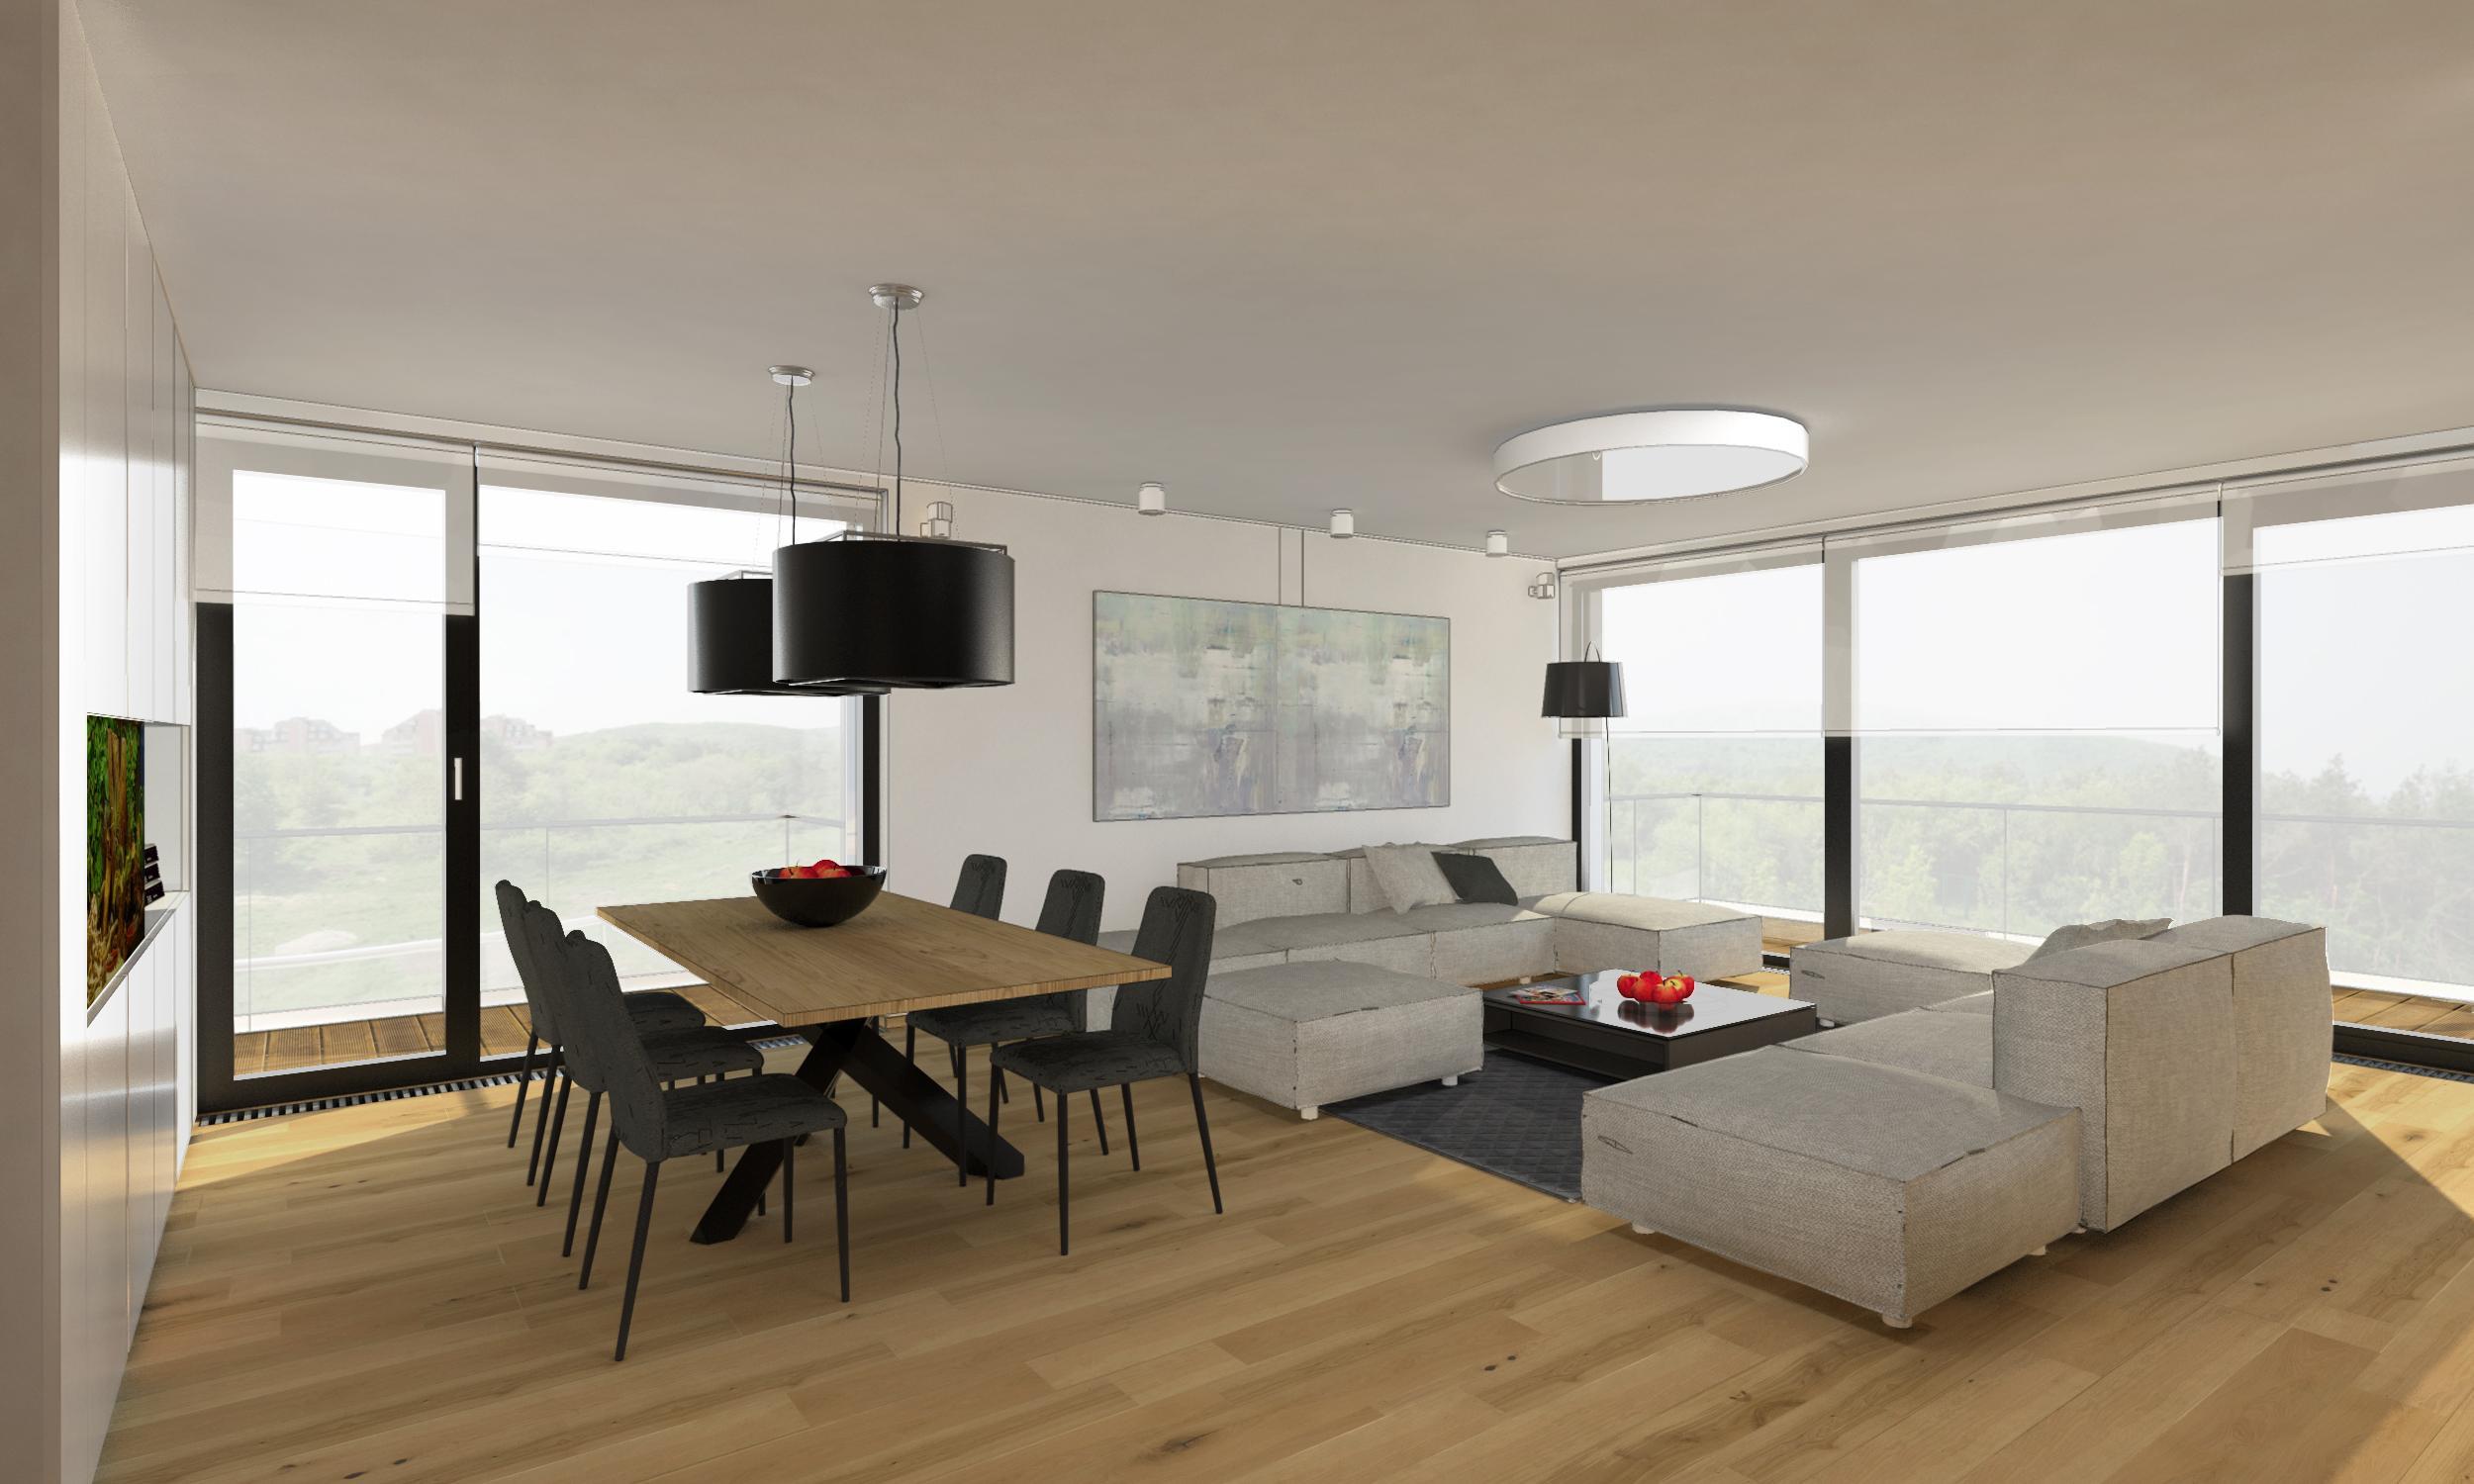 Gro es apartment villa vista bratislava slowakei for Innenraum design blog